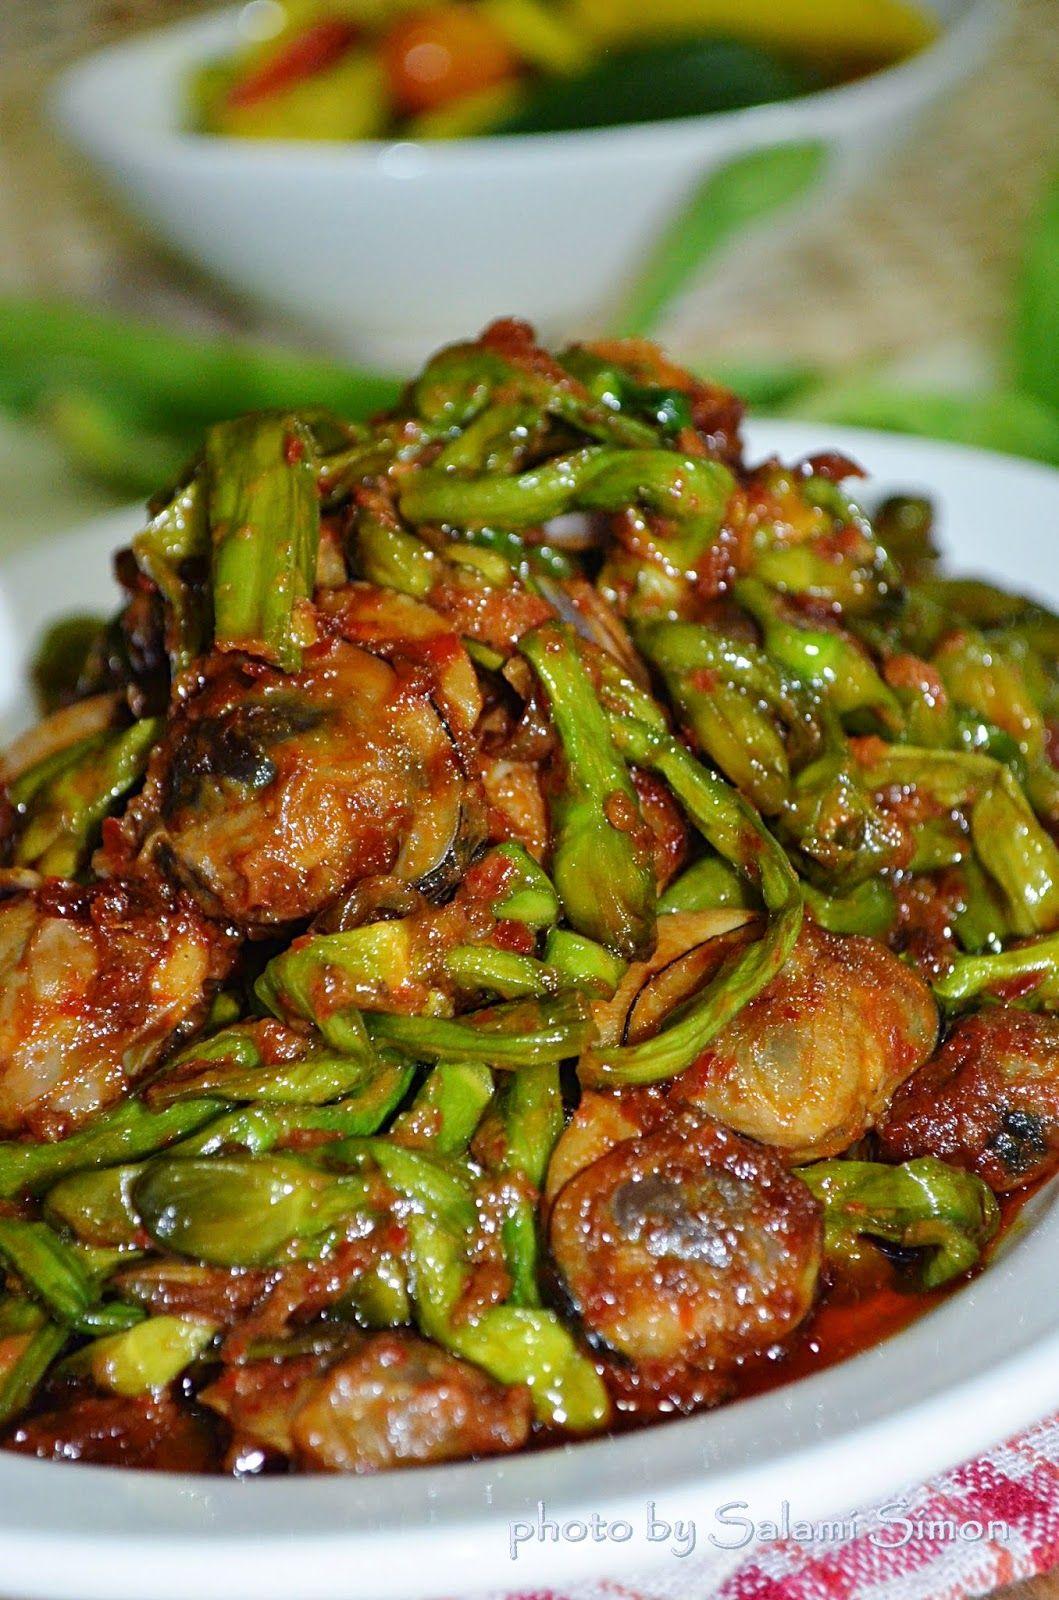 Pin Oleh Rashidah Abdullah Di Vegetables Recipes Di 2021 Resep Sayuran Tumis Diet